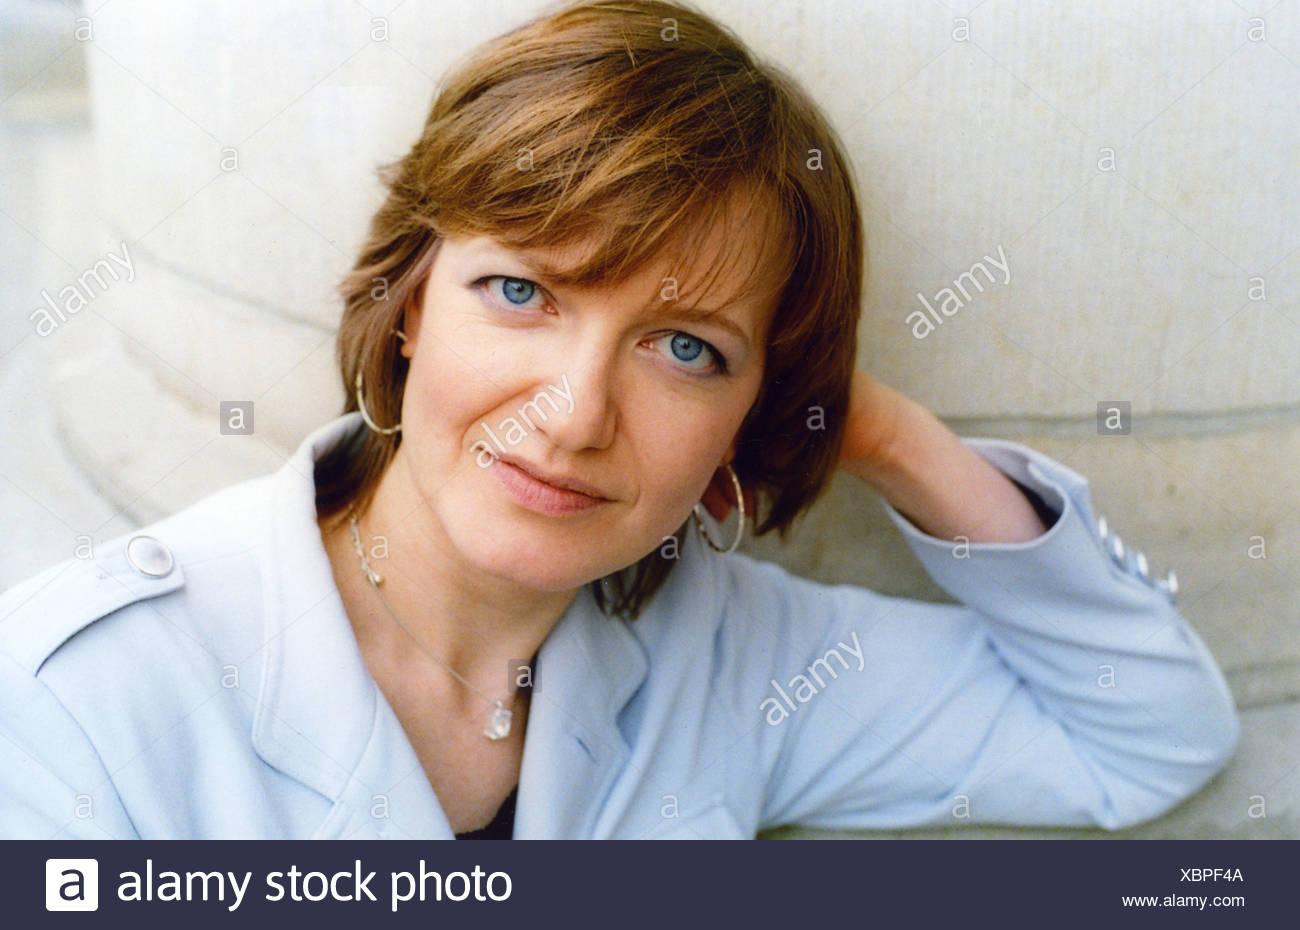 Hummel, Eleonora, * 1970, German author / writer, portrait, International PEN Congress, Berlin, 22. - 28.5.2006, Additional-Rights-Clearances-NA - Stock Image